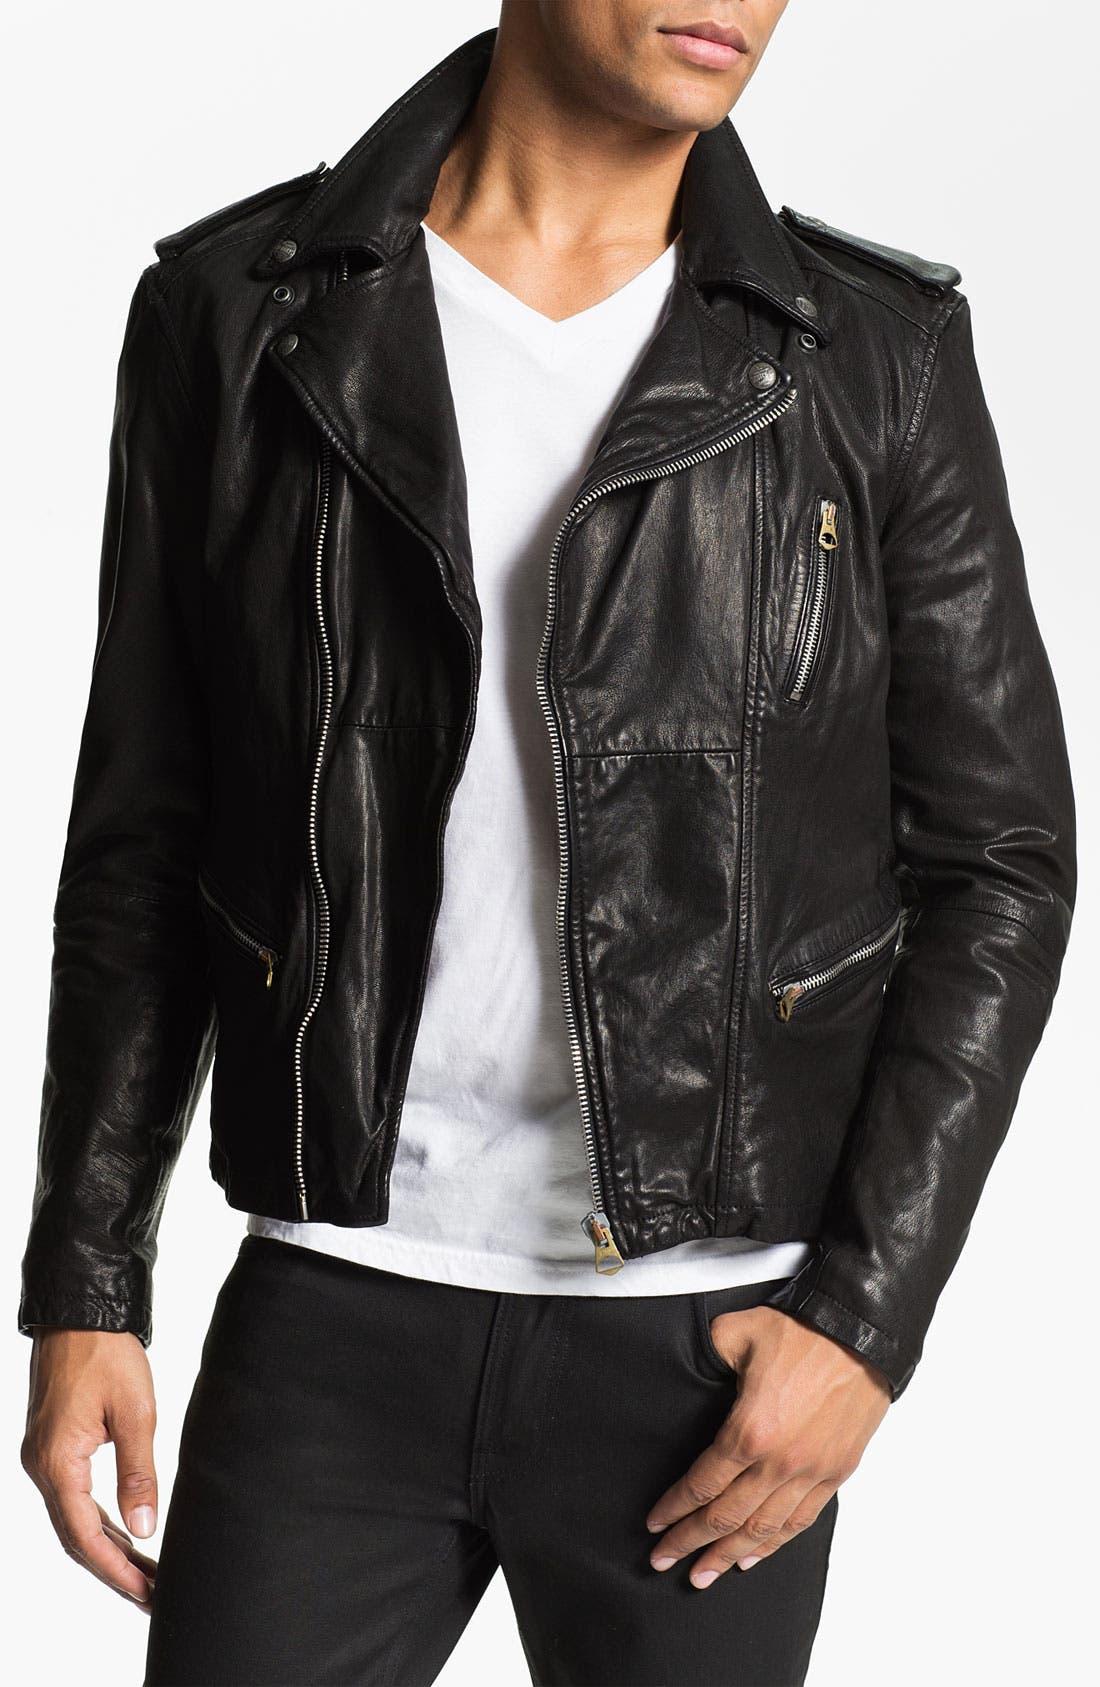 Alternate Image 1 Selected - Scotch & Soda 'Rocker' Leather Jacket